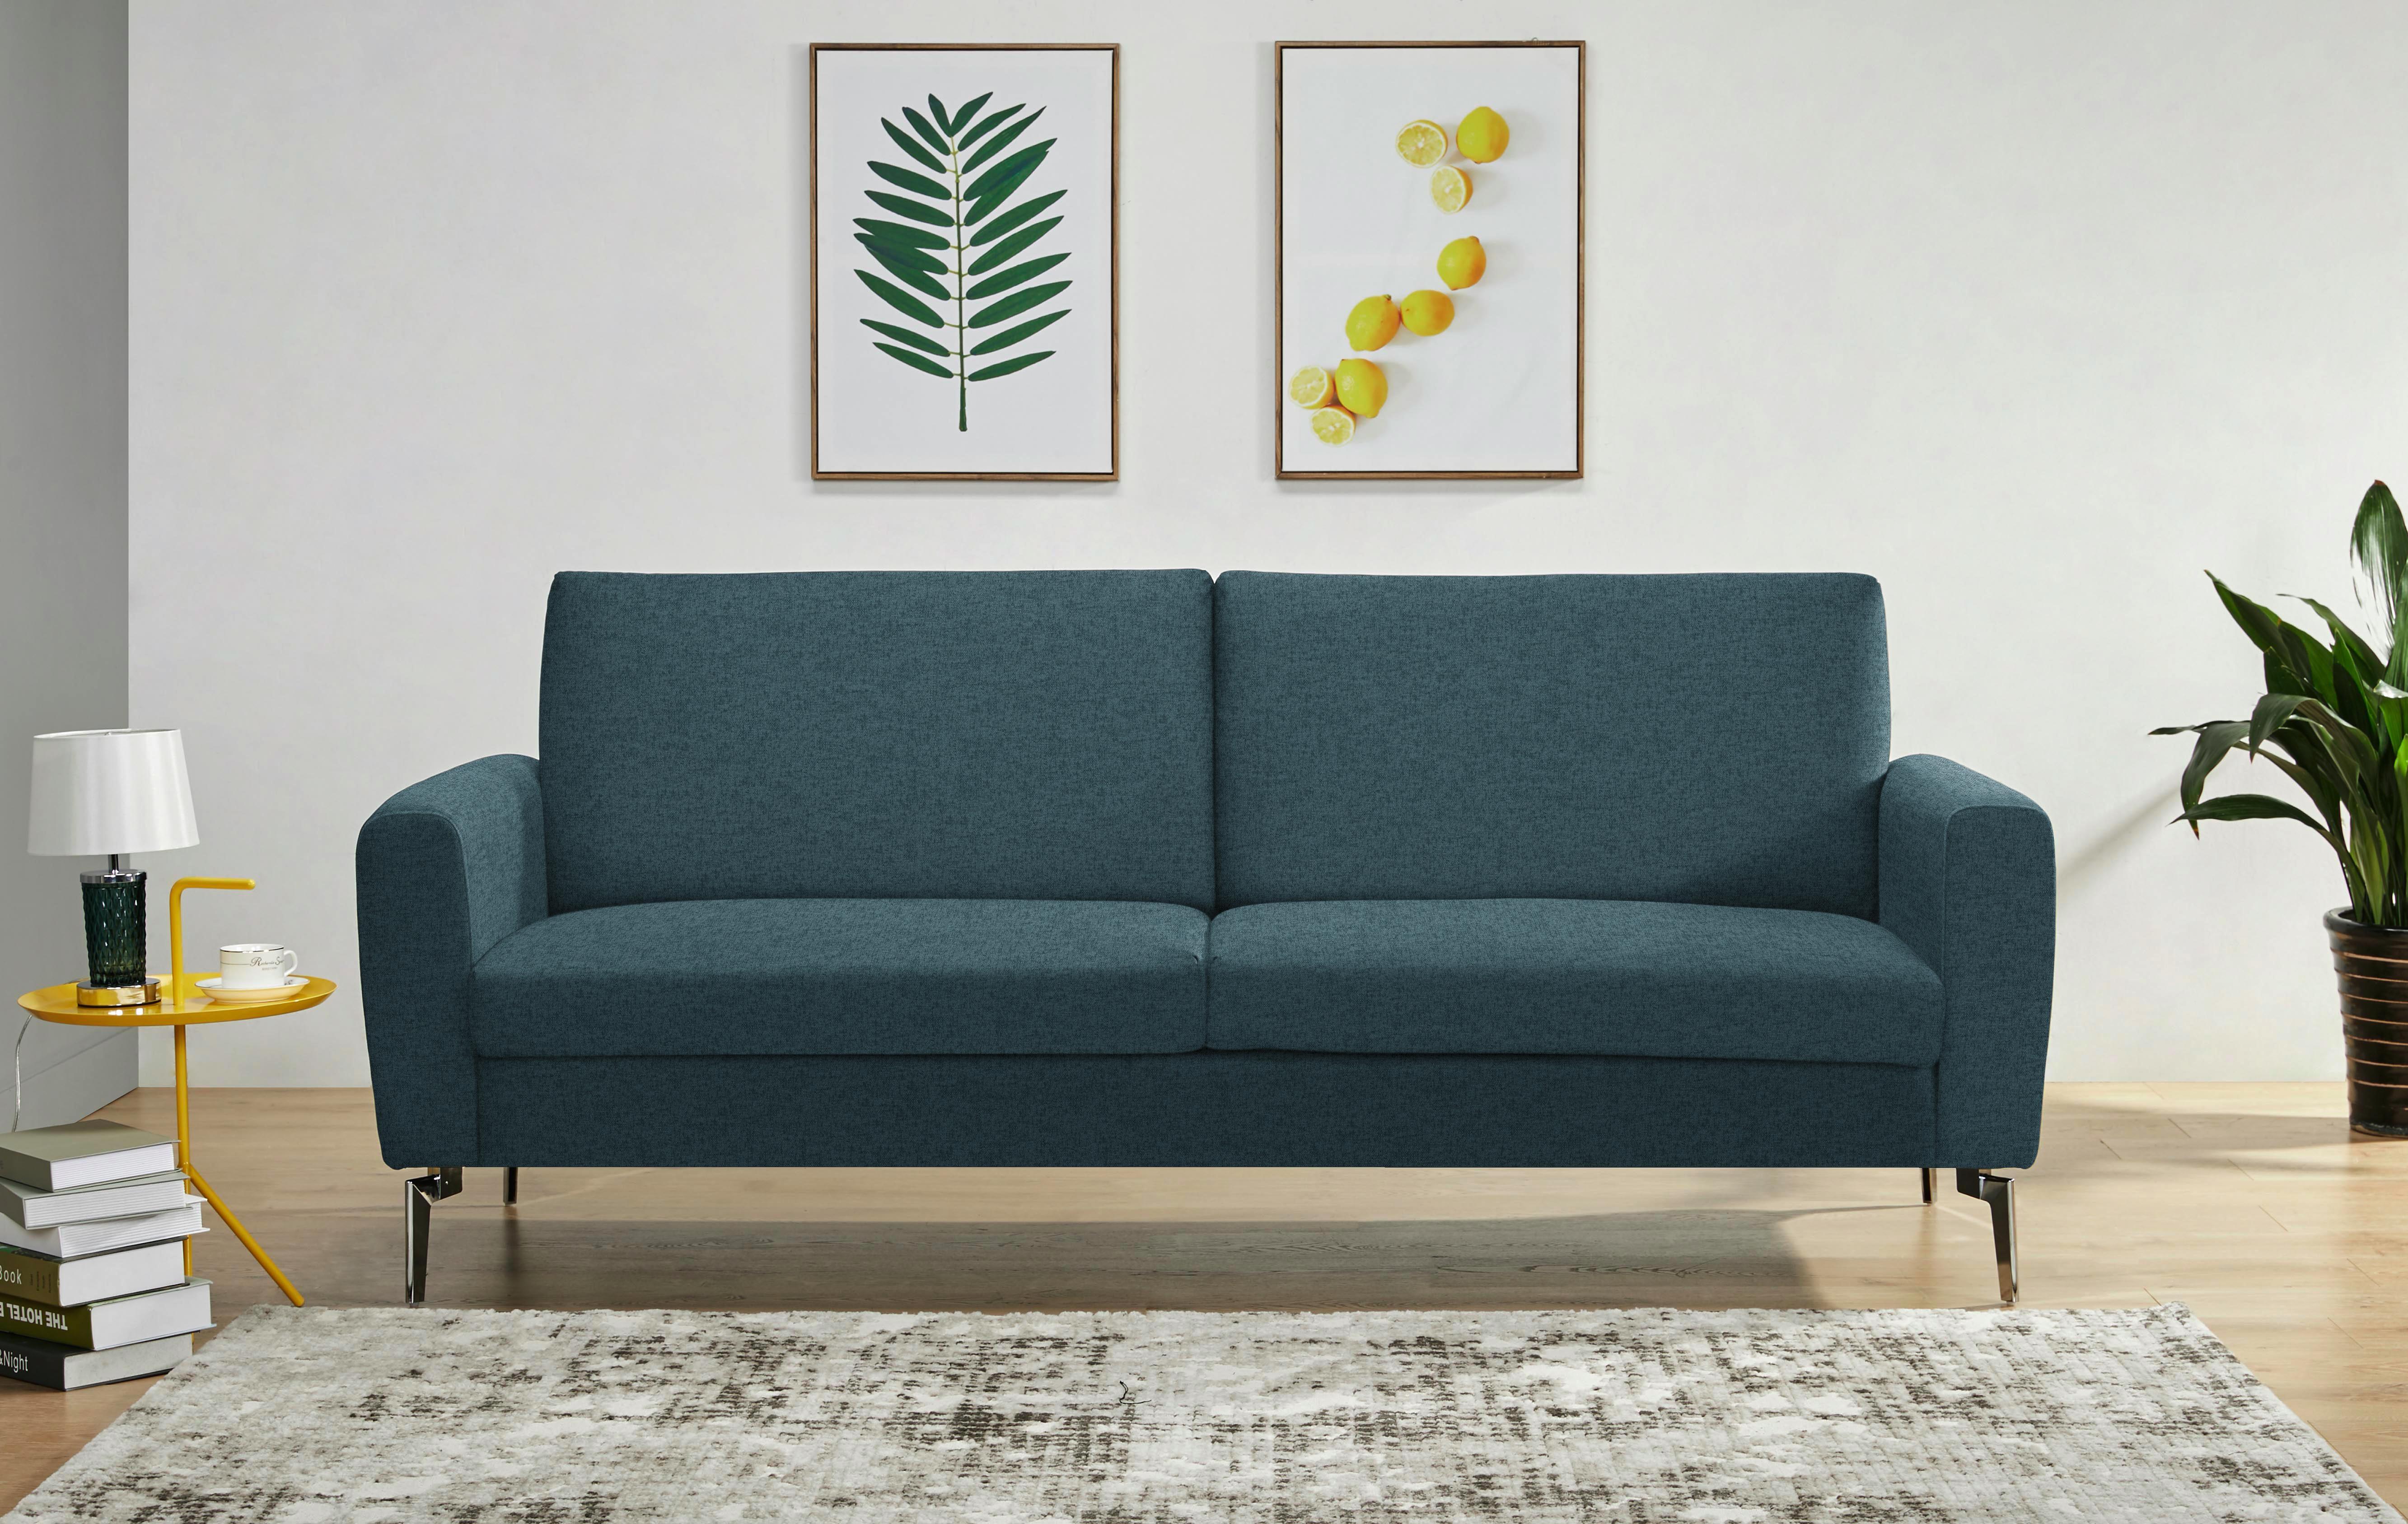 Etagenbett Xxl Möbel : Design kinderzimmer hochbett etagenbett bett schubladen treppe